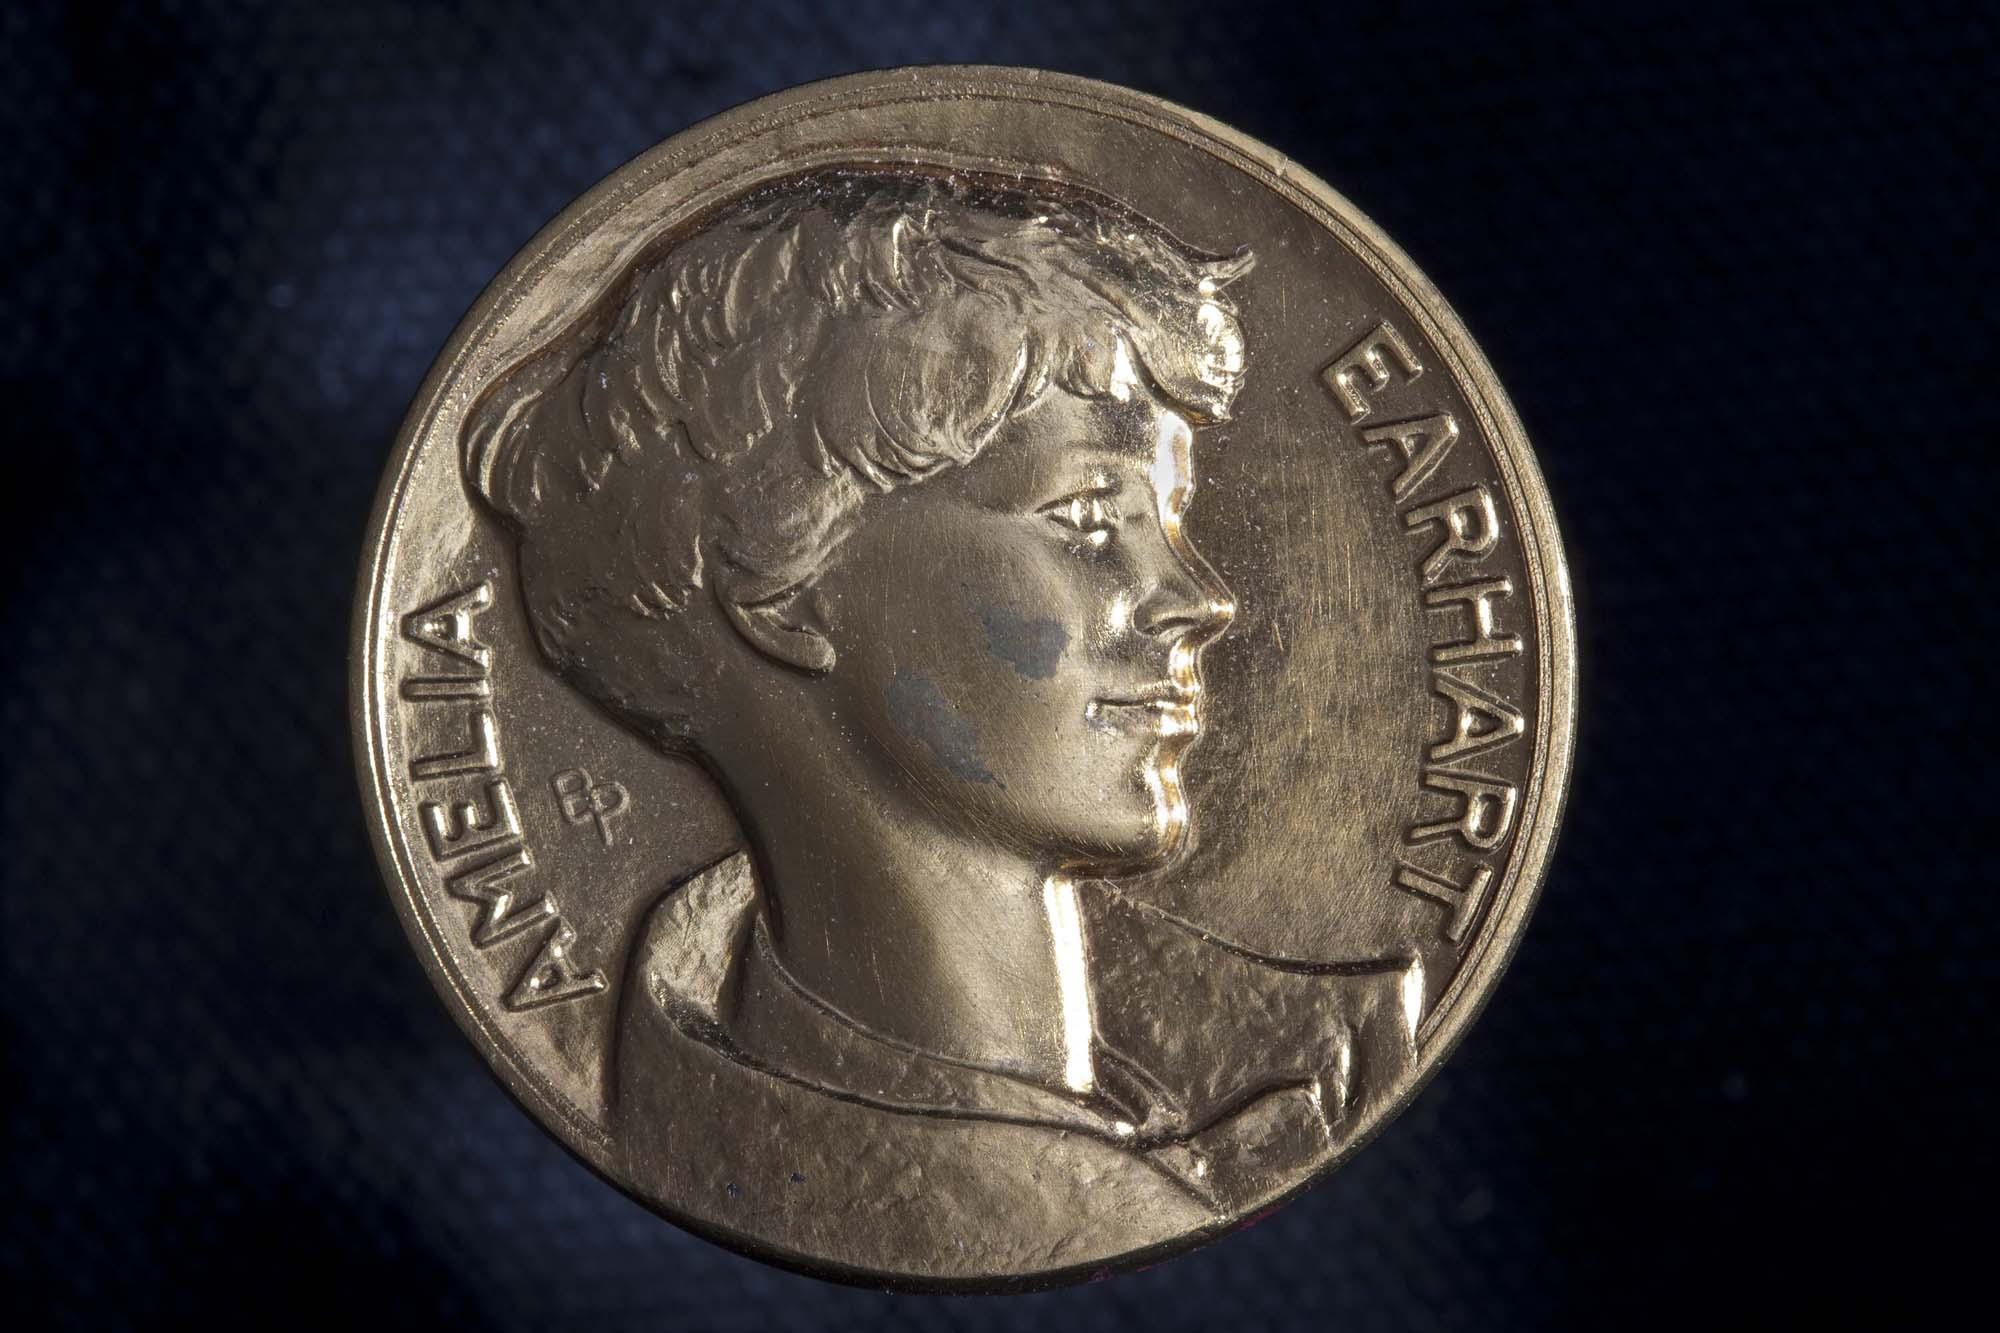 Amelia Earhart Medal (Front)